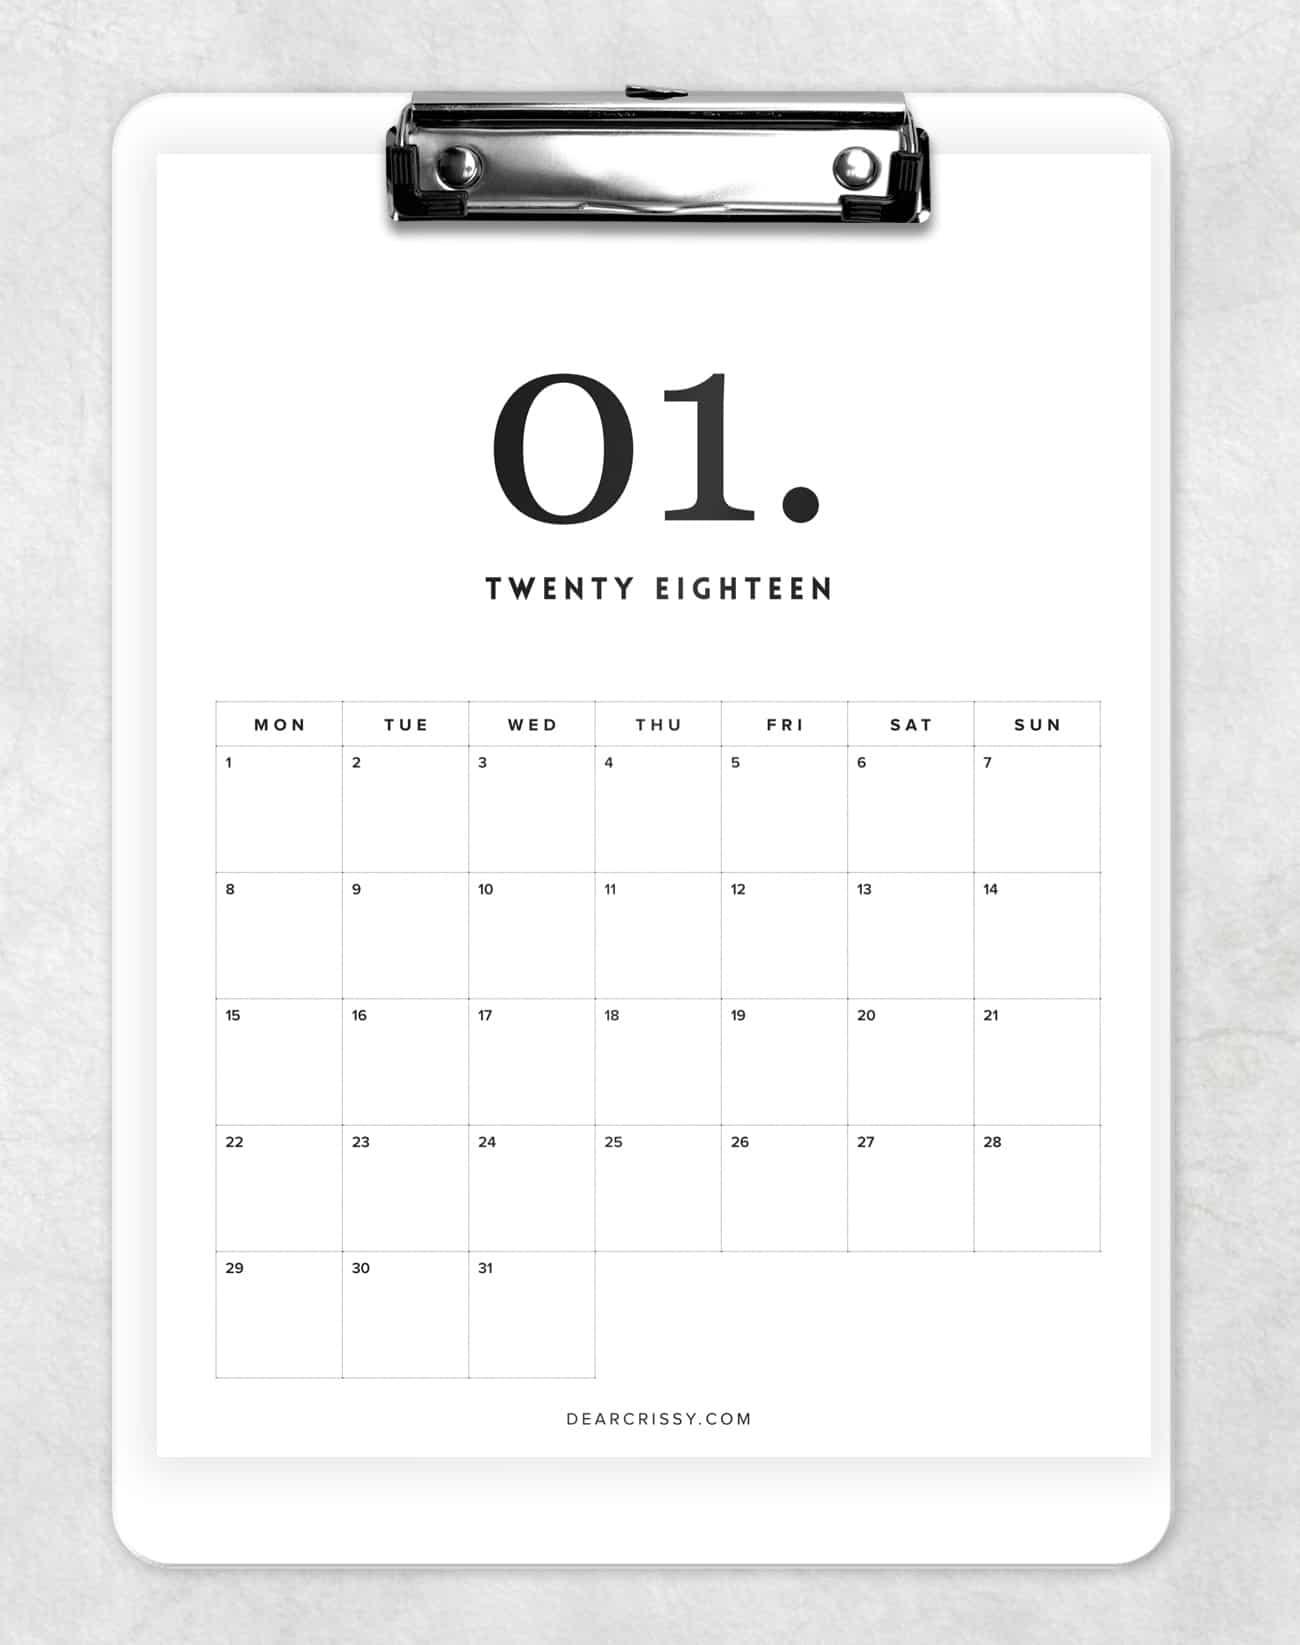 photograph relating to Calendar Printable called Totally free 2018 Minimum Calendar Printable - Impressive Calendar